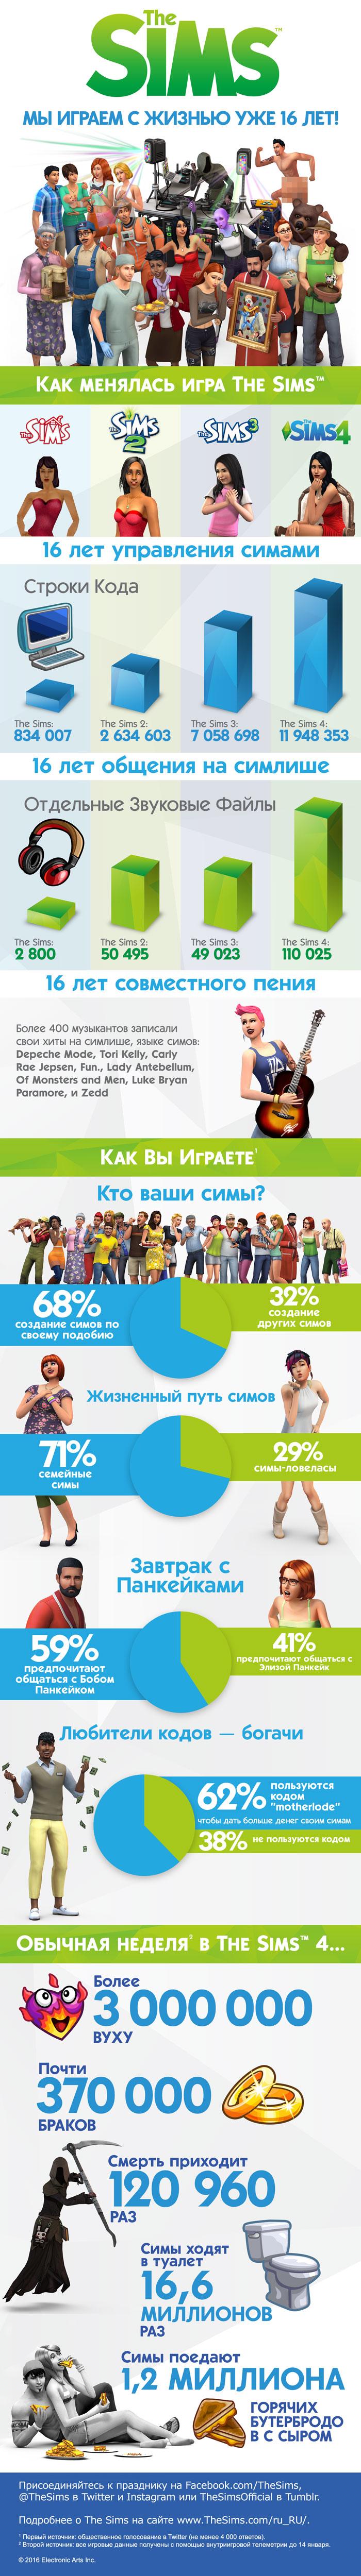 TS4_16th_Anniversary_infographic_RU_r4 (2)